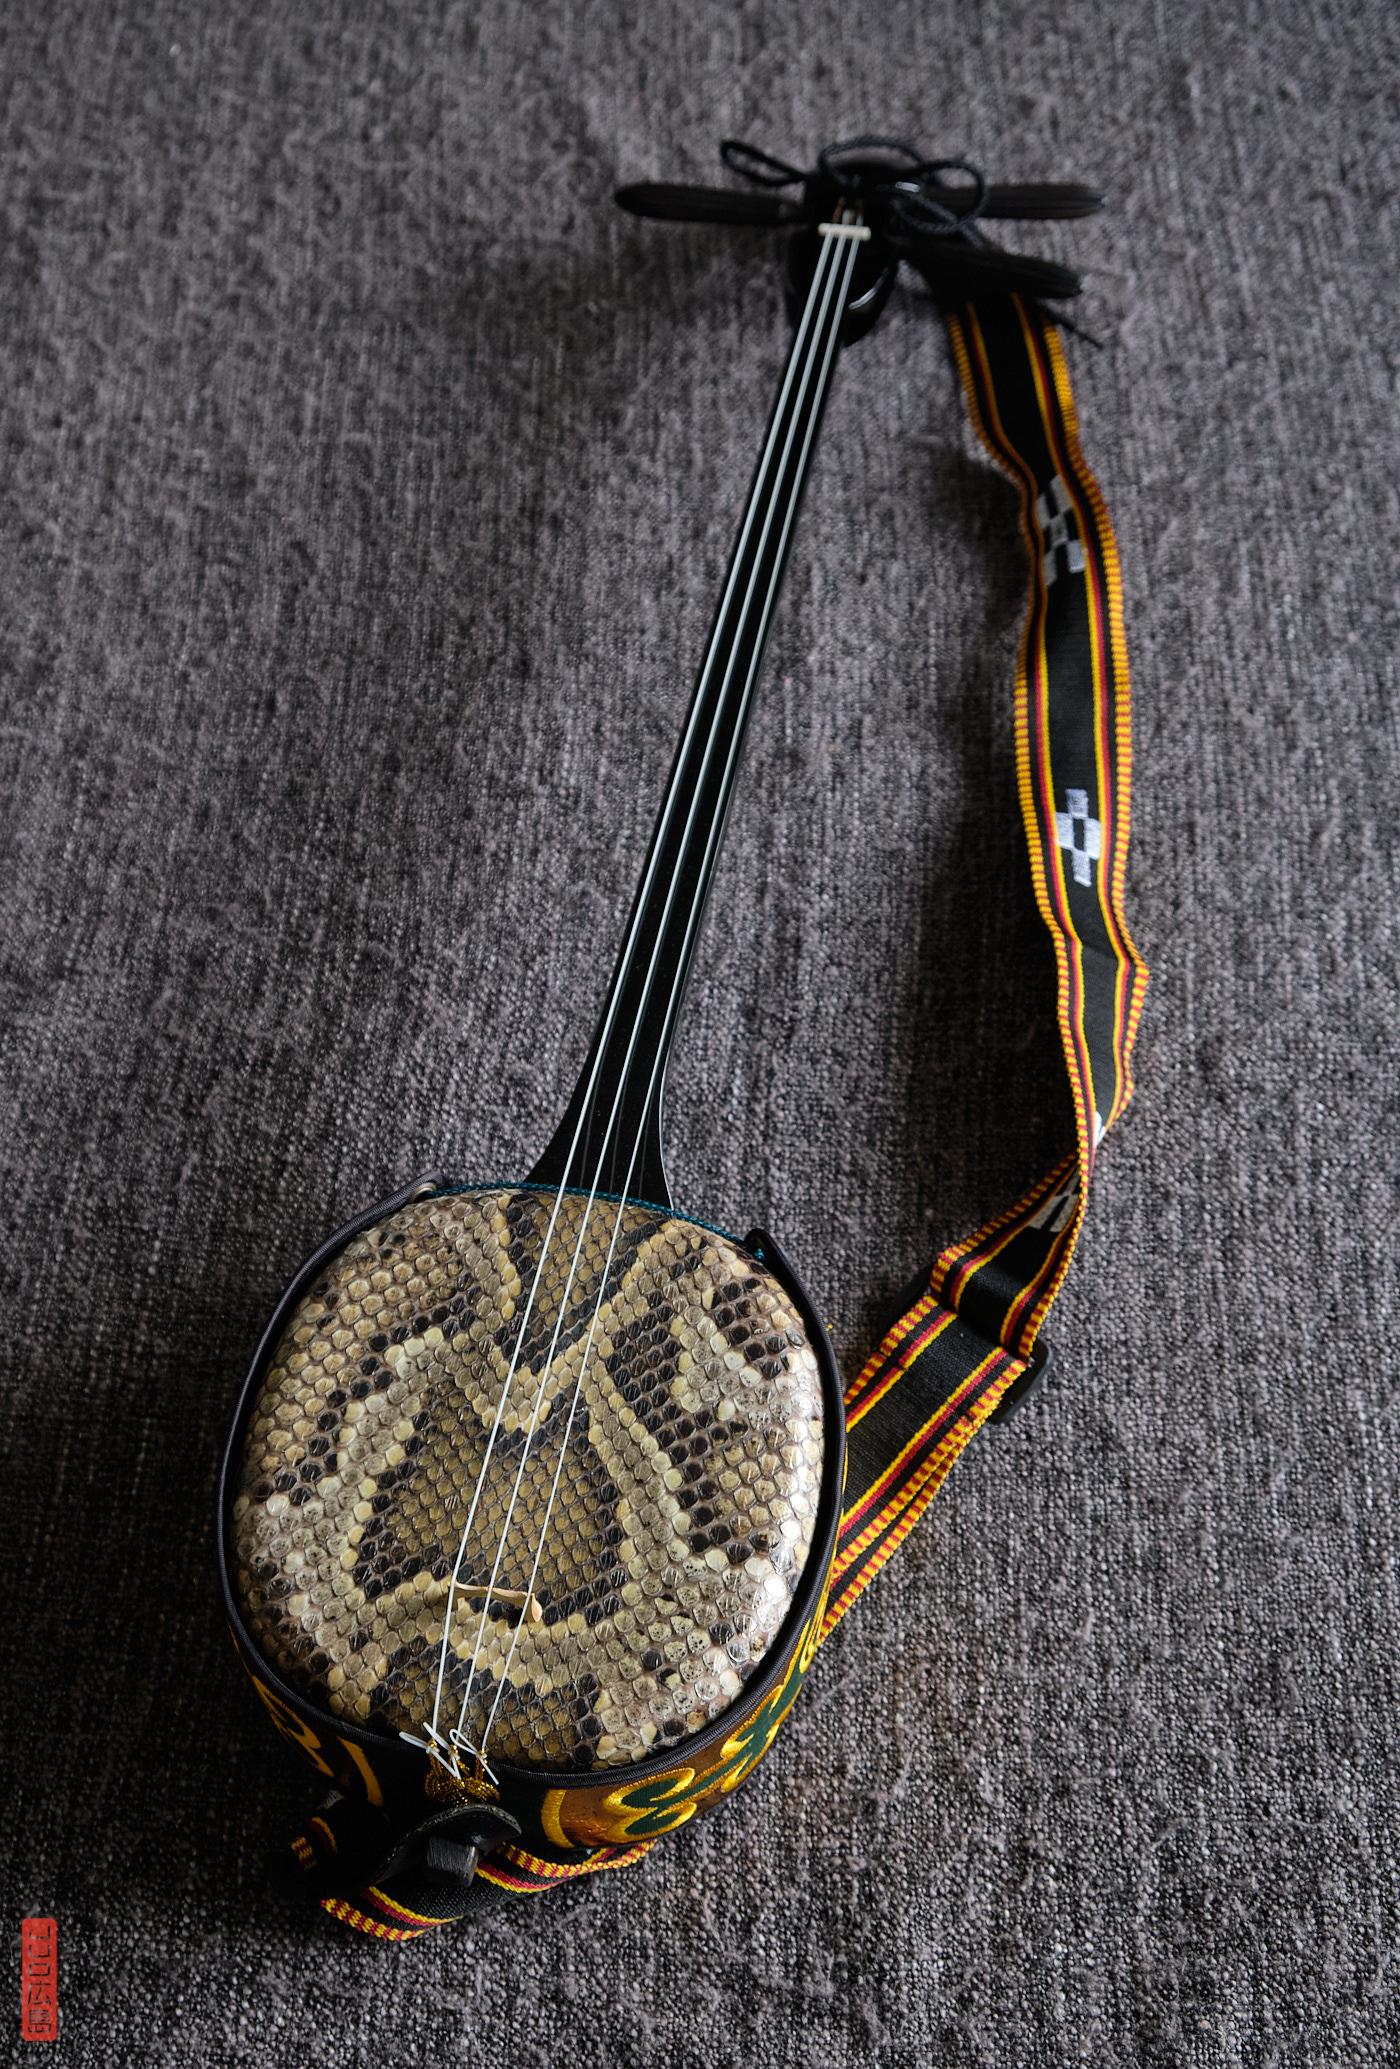 Sanshin, instrument d'Okinawa à 3 cordes